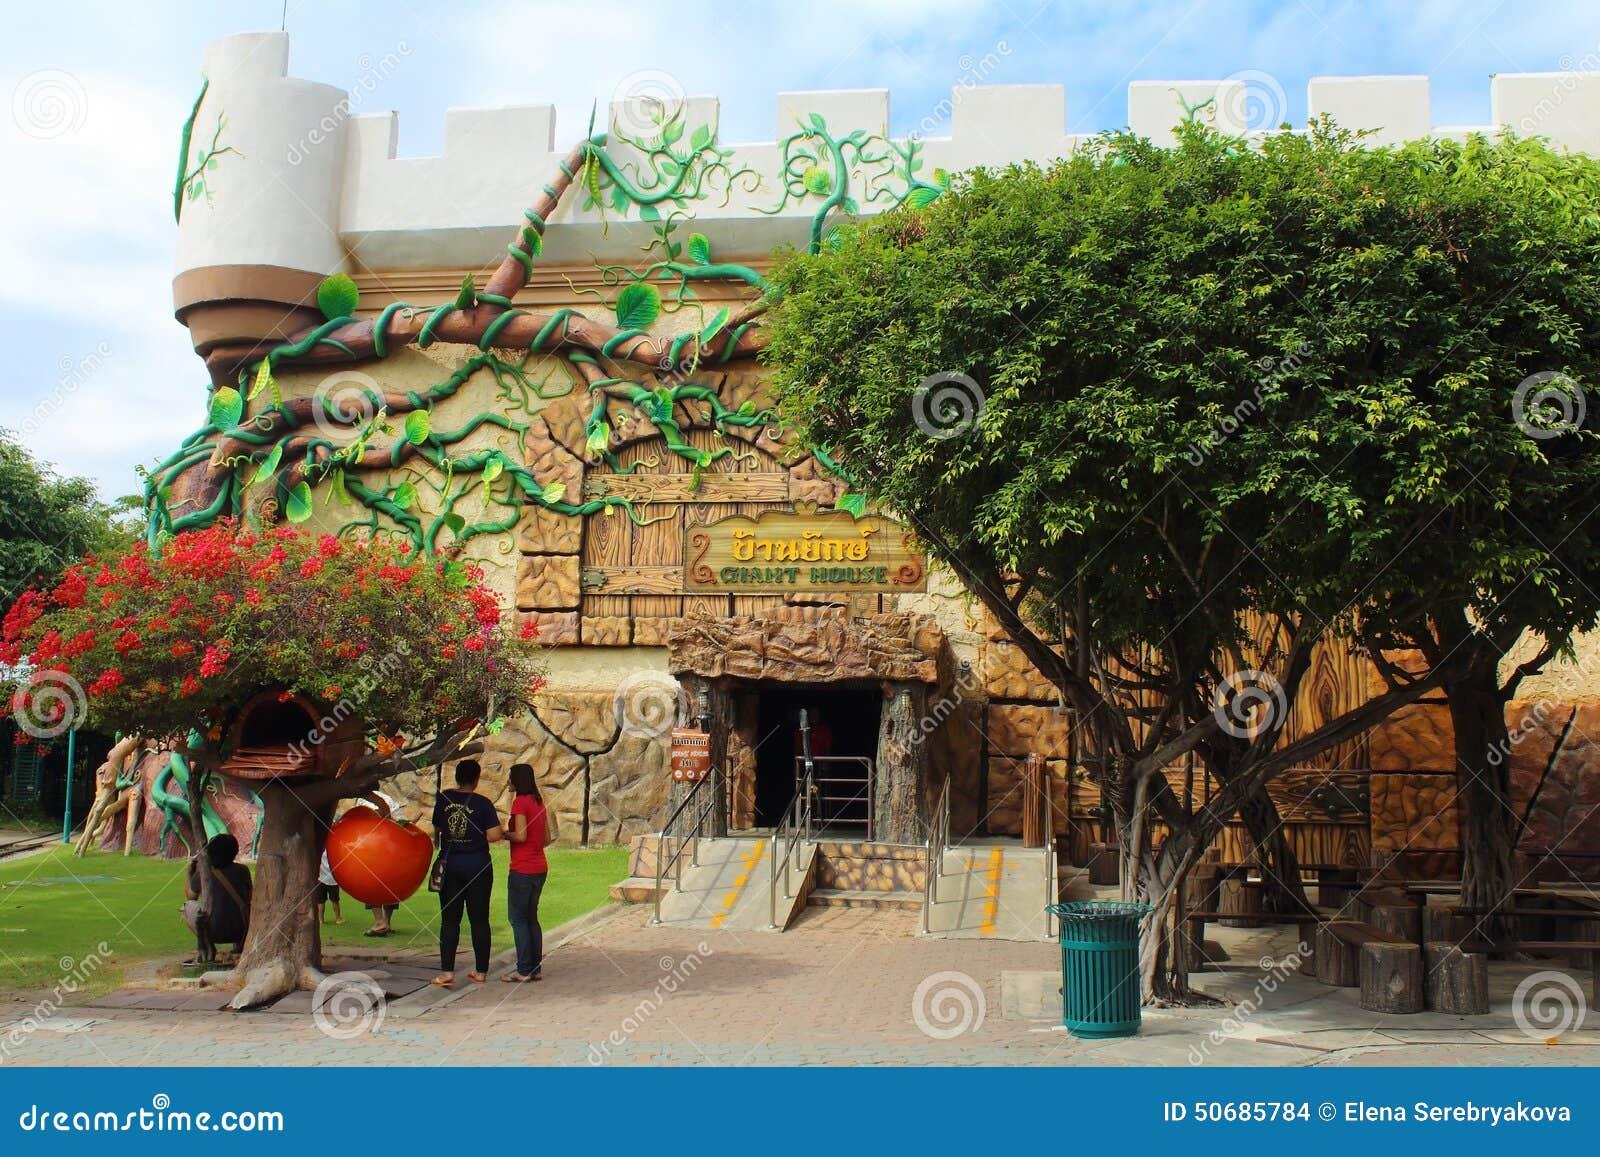 Download 巨型议院 曼谷梦想公园世界 编辑类库存图片. 图片 包括有 招待, 童话, 巨型, 神仙, 庭院, 娱乐 - 50685784